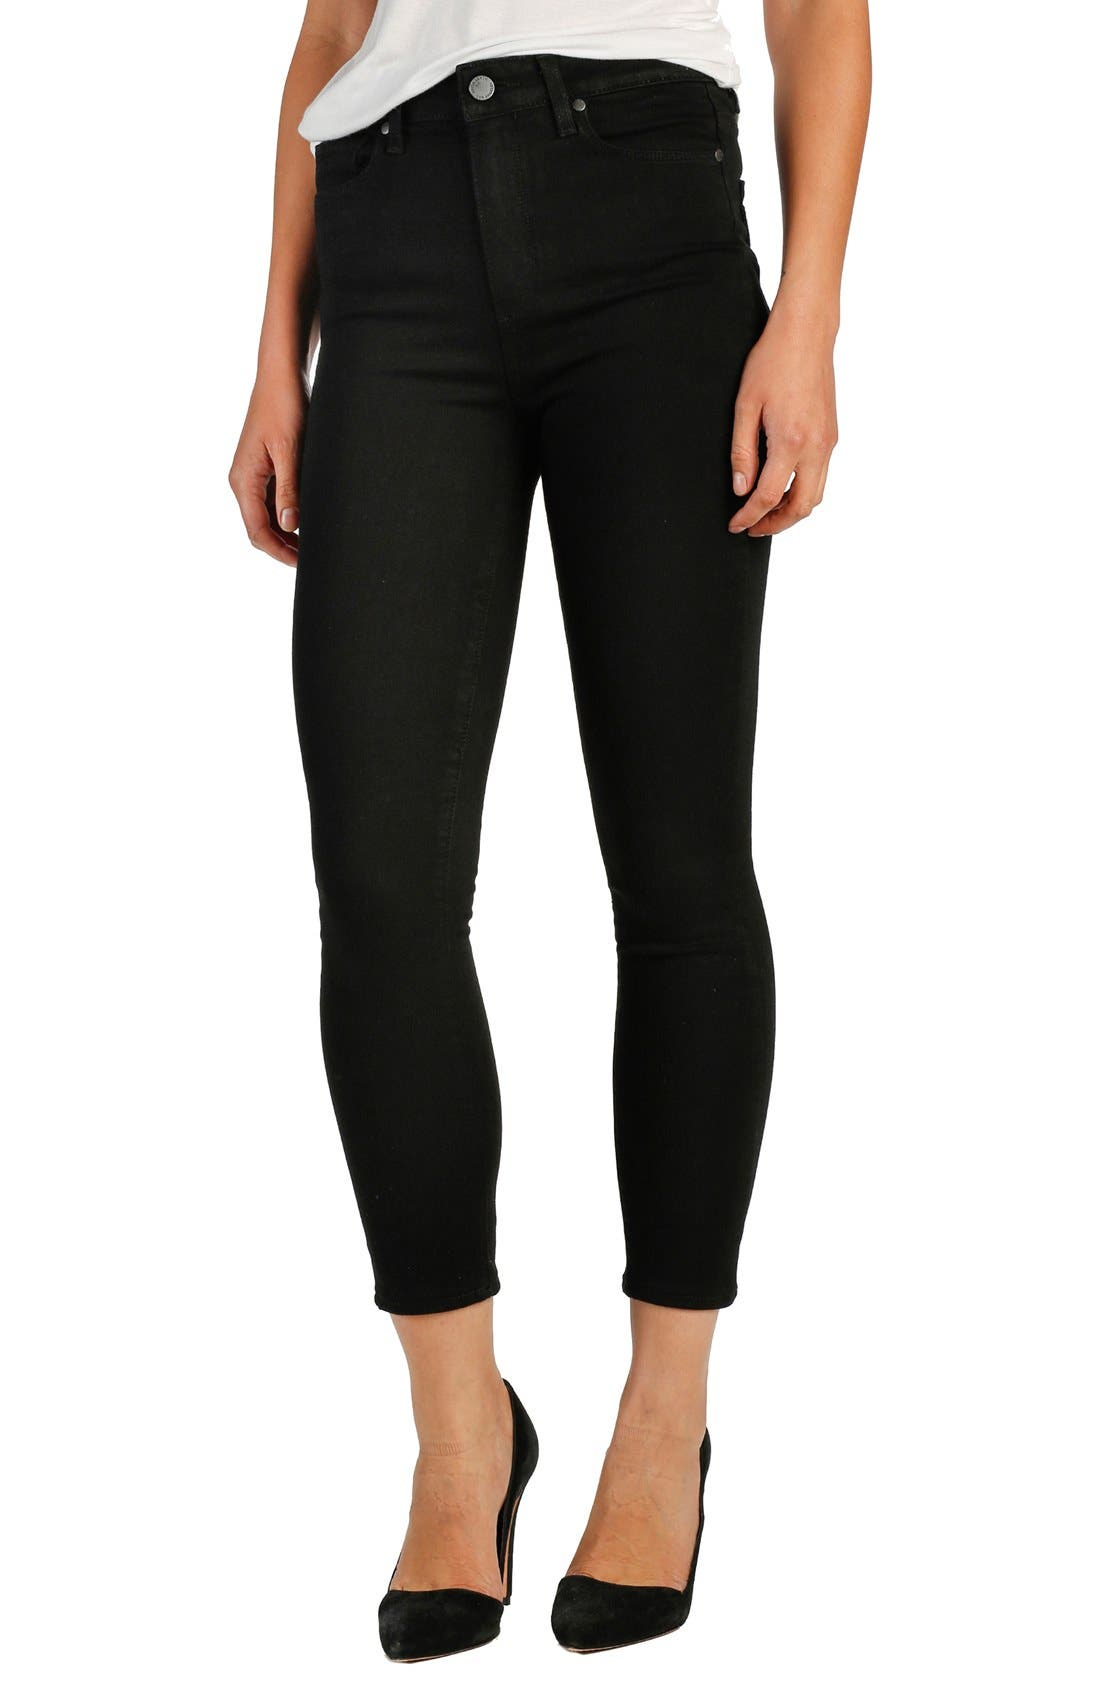 Transcend - Margot High Waist Crop Ultra Skinny Jeans,                             Main thumbnail 1, color,                             Black Shadow